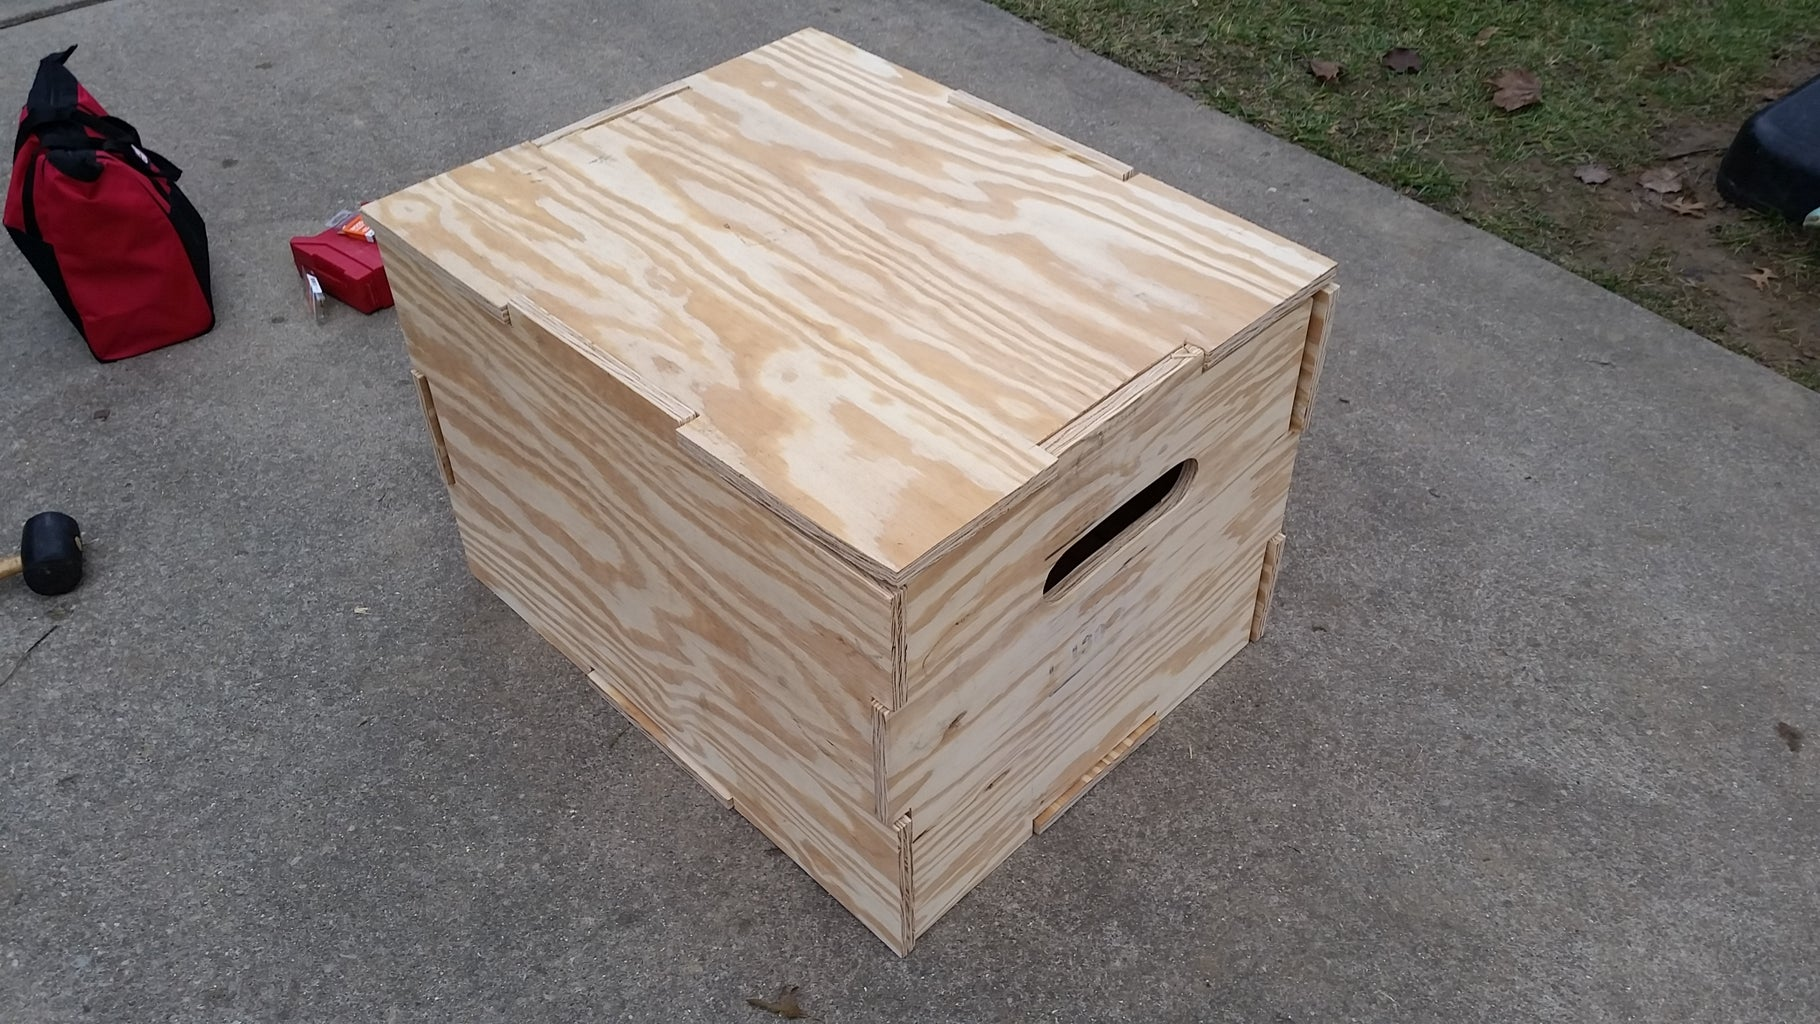 Diy Plyobox for Under $35